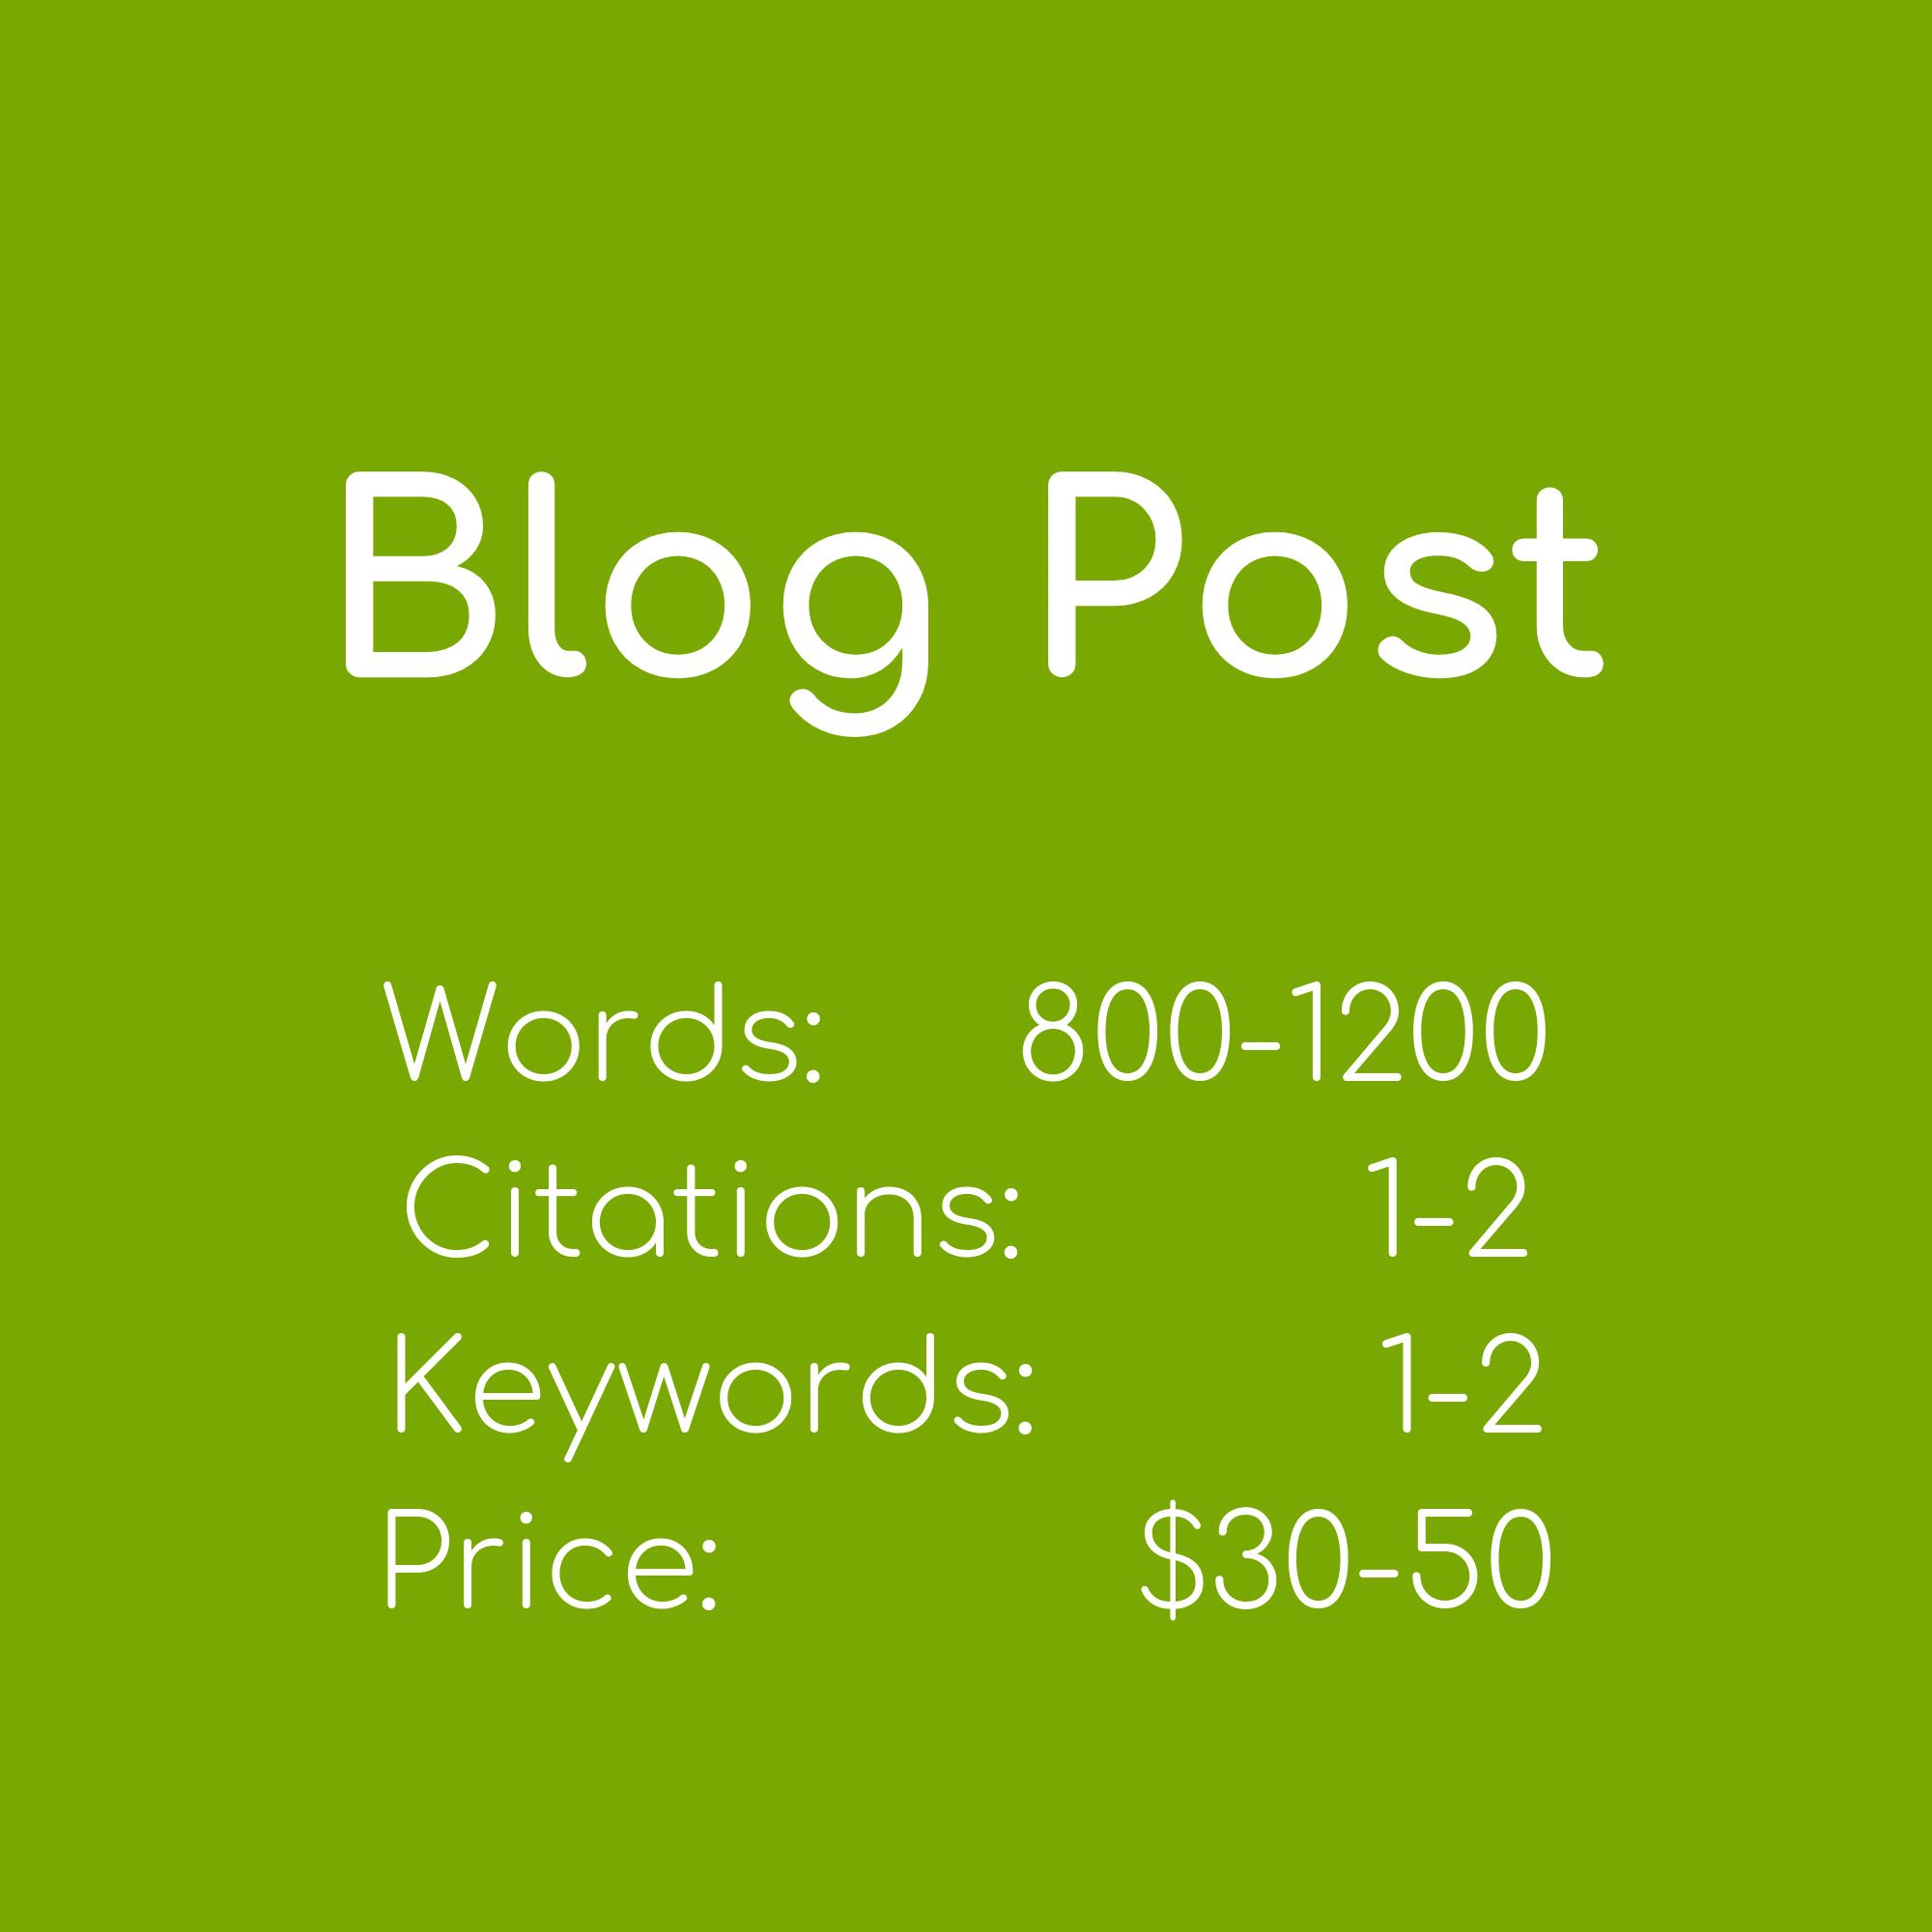 Copy of Blog Post.png